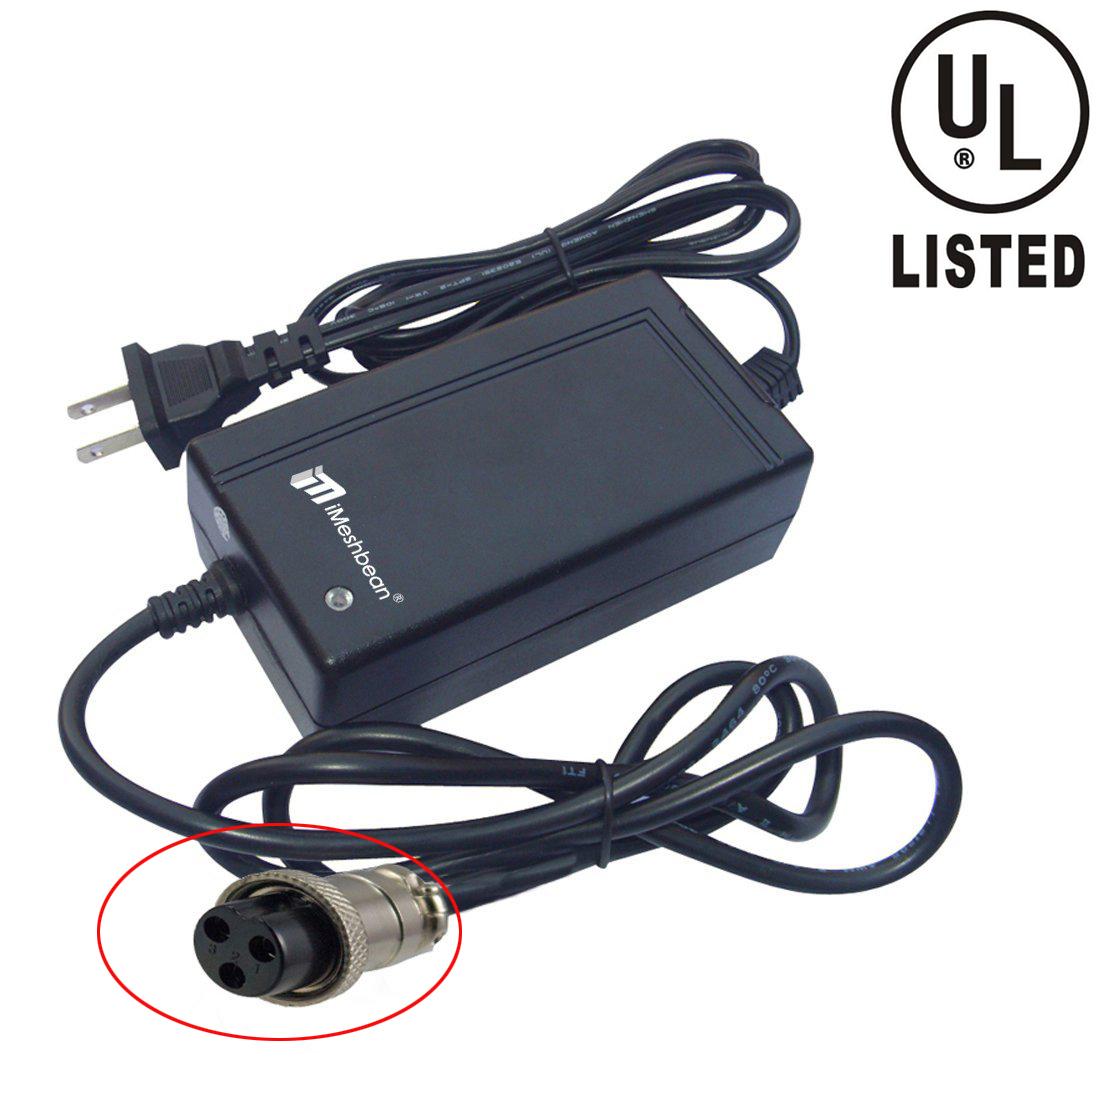 24 volt scooter chargers 24 volt razor charger wire diagram [ 1096 x 1096 Pixel ]